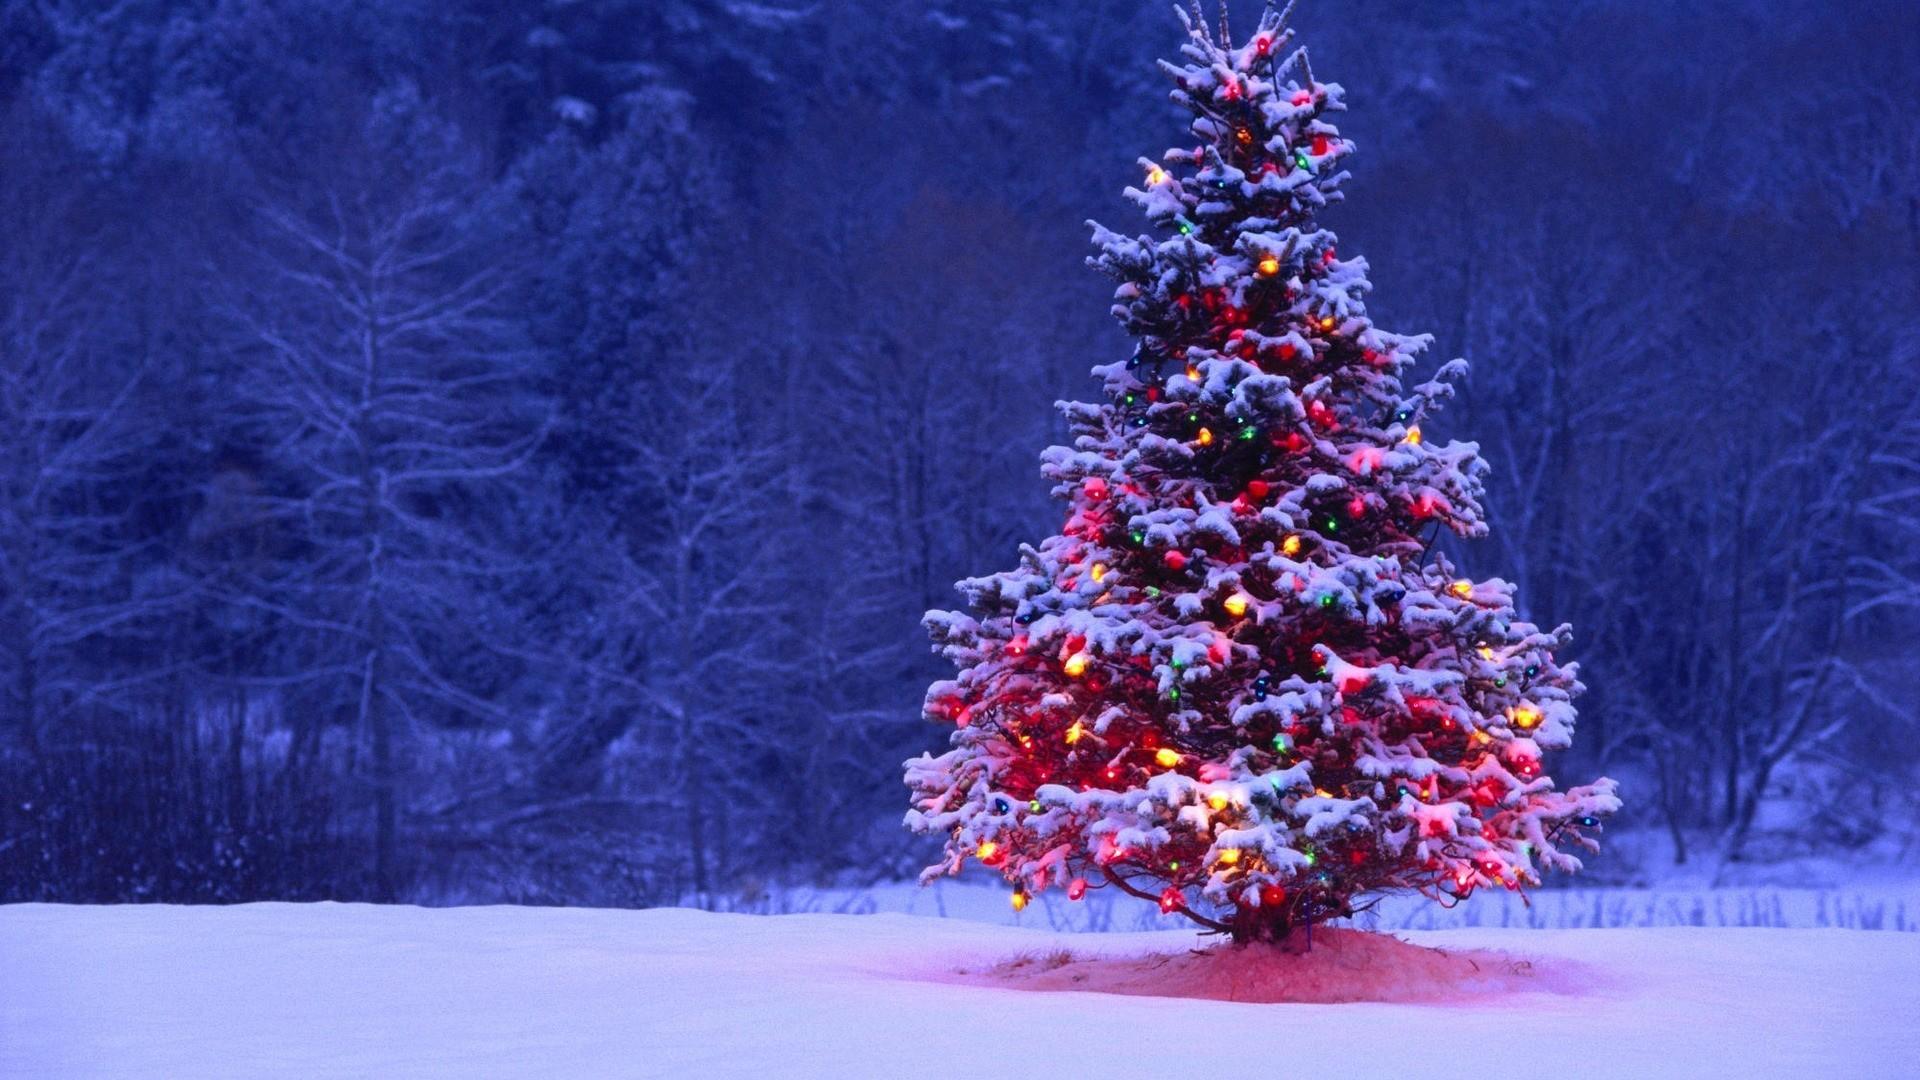 Res: 1920x1080, beautiful christmas hd image